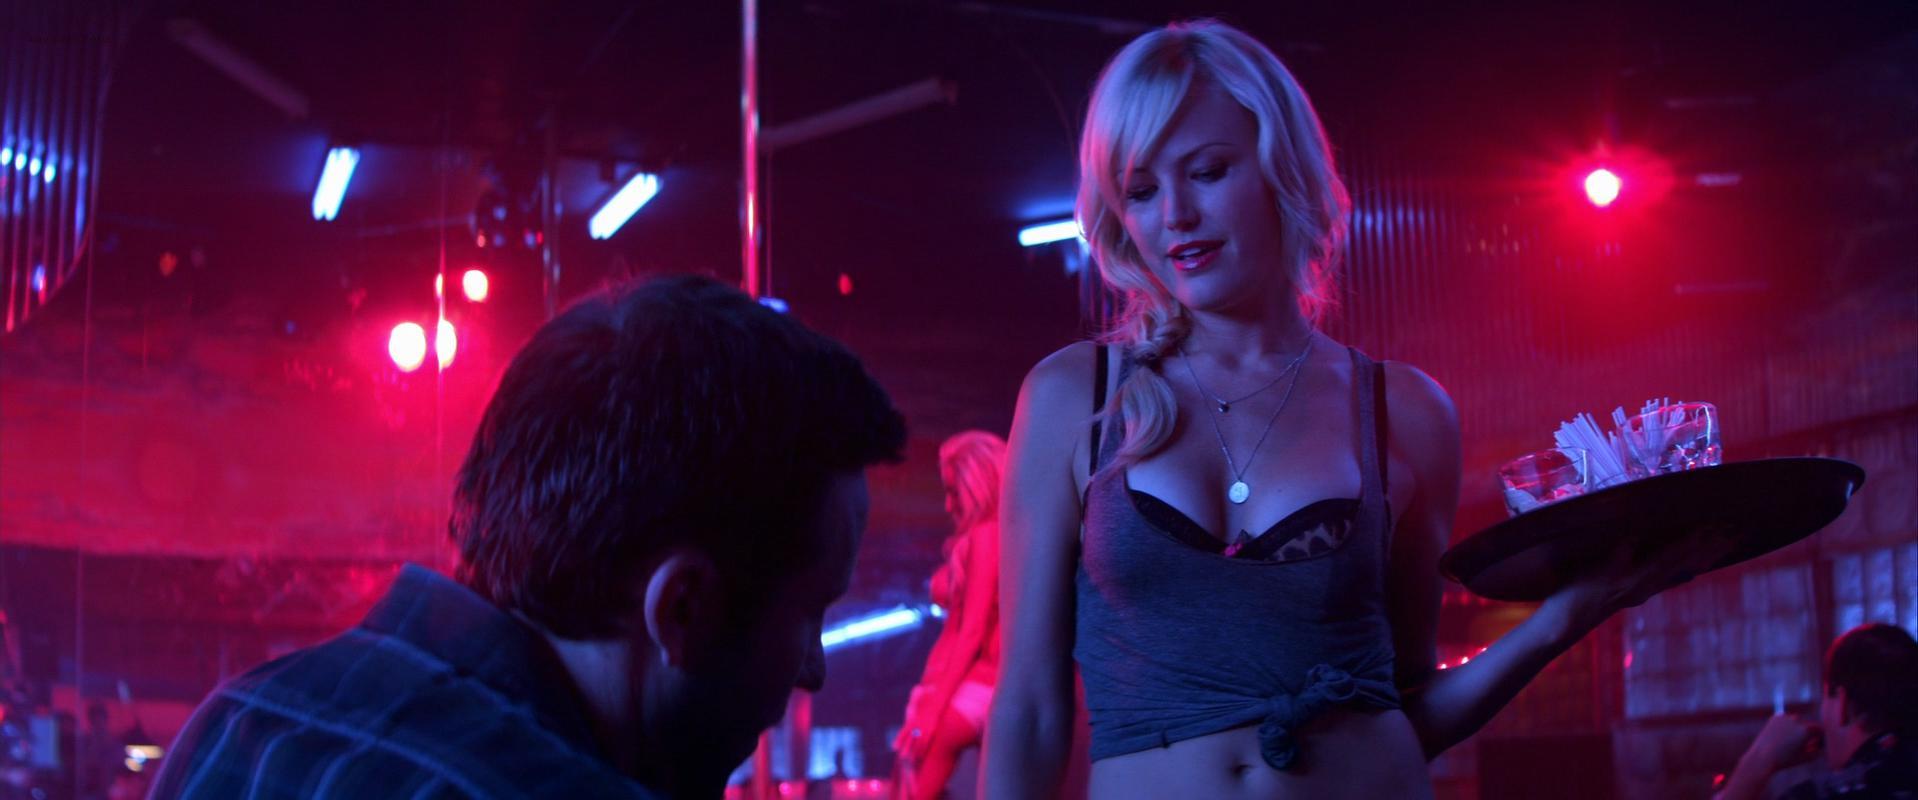 Malin Akerman sexy, Nikita Kahn sexy - Catch .44 (2011)